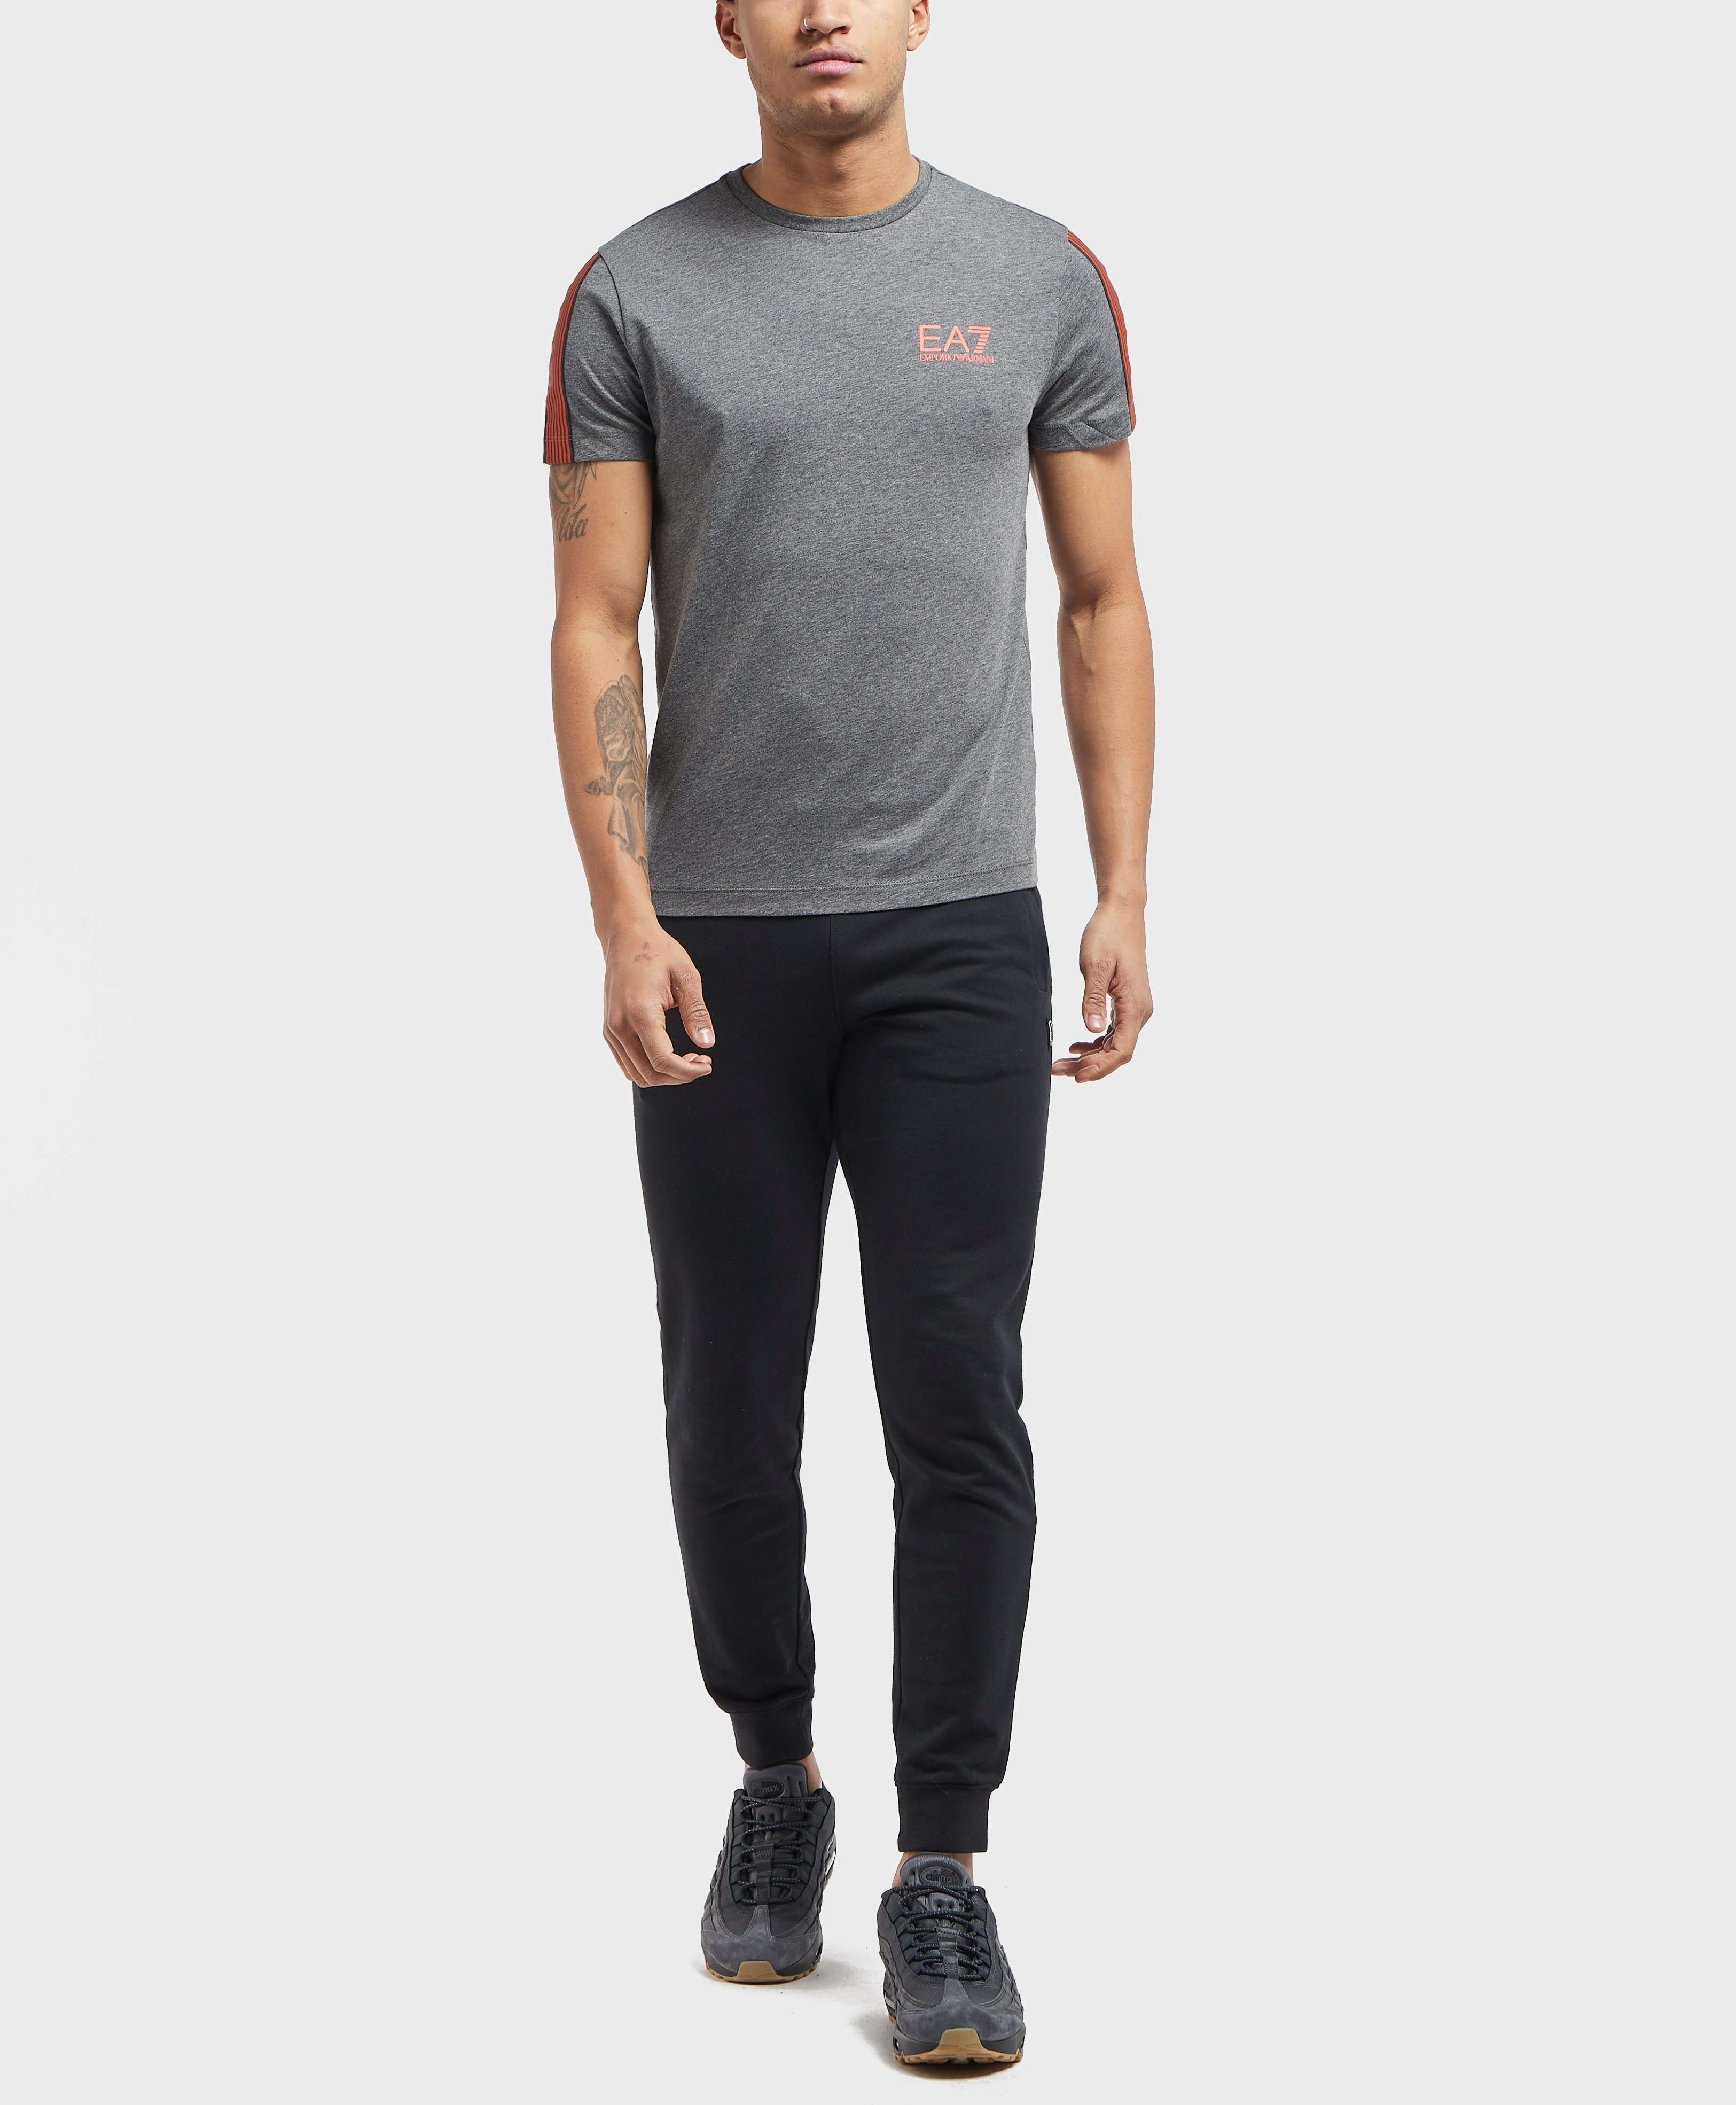 Emporio Armani EA7 7 Lines Short Sleeve Crew T-Shirt